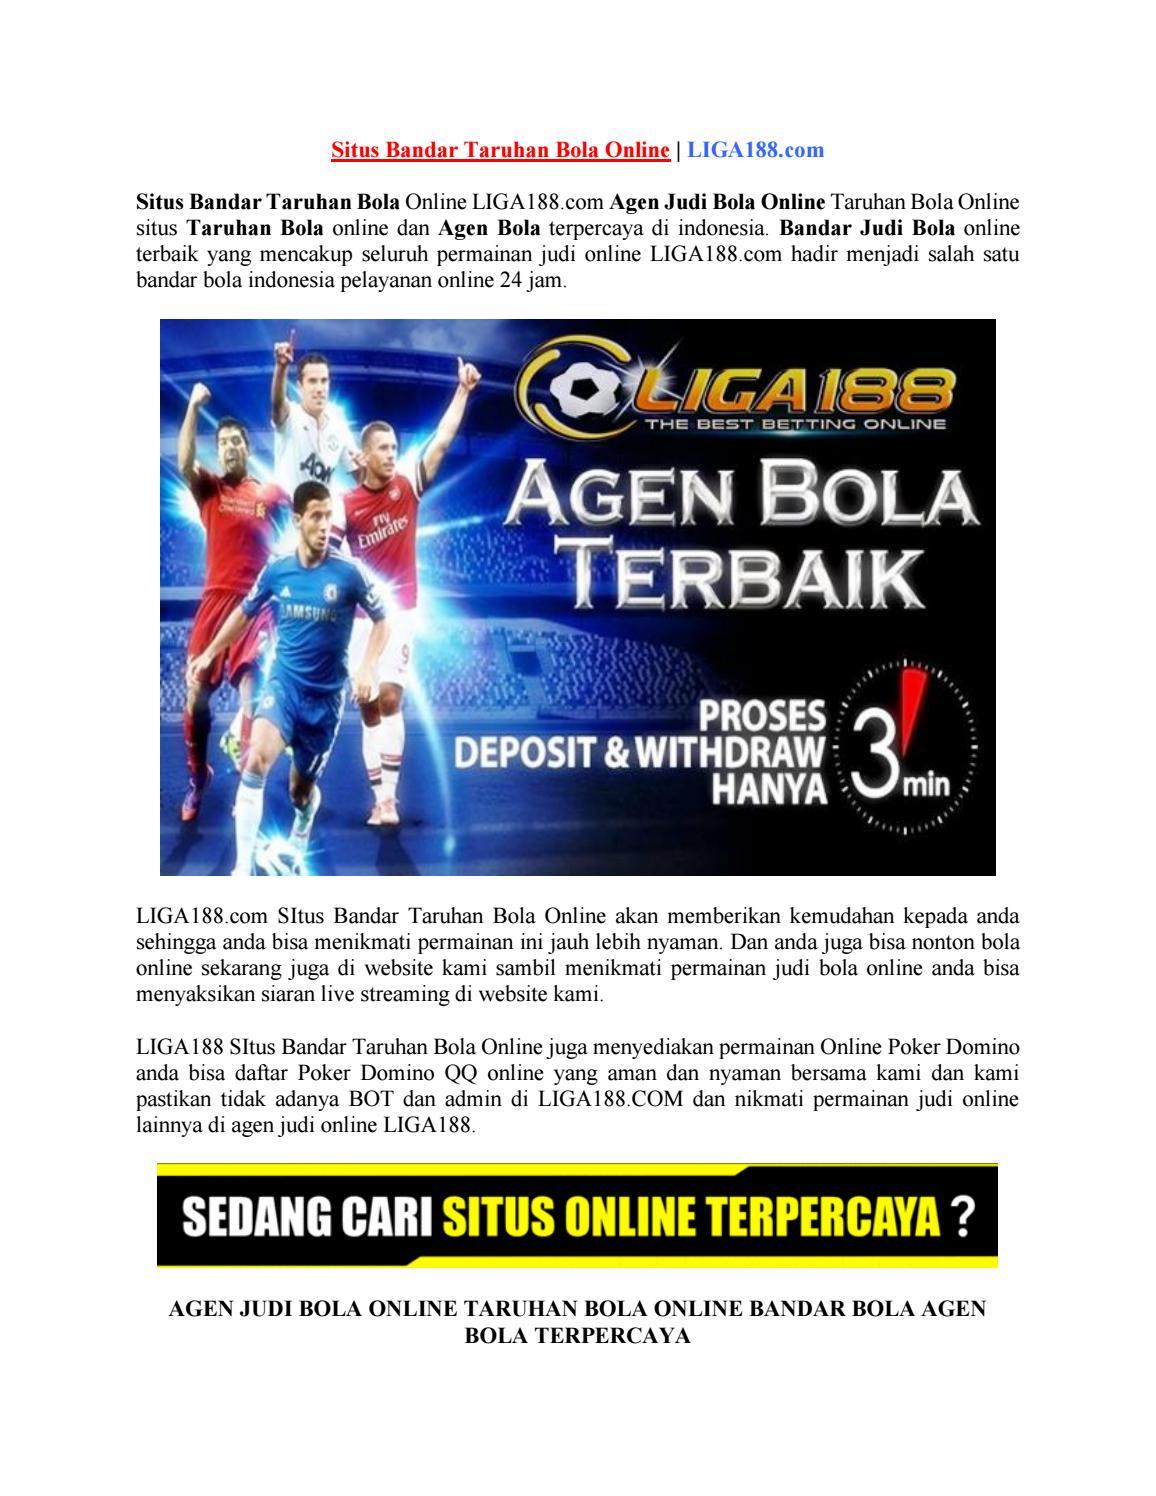 Situs Bandar Taruhan Bola Online Liga188 Com By Situs Judi Online Issuu